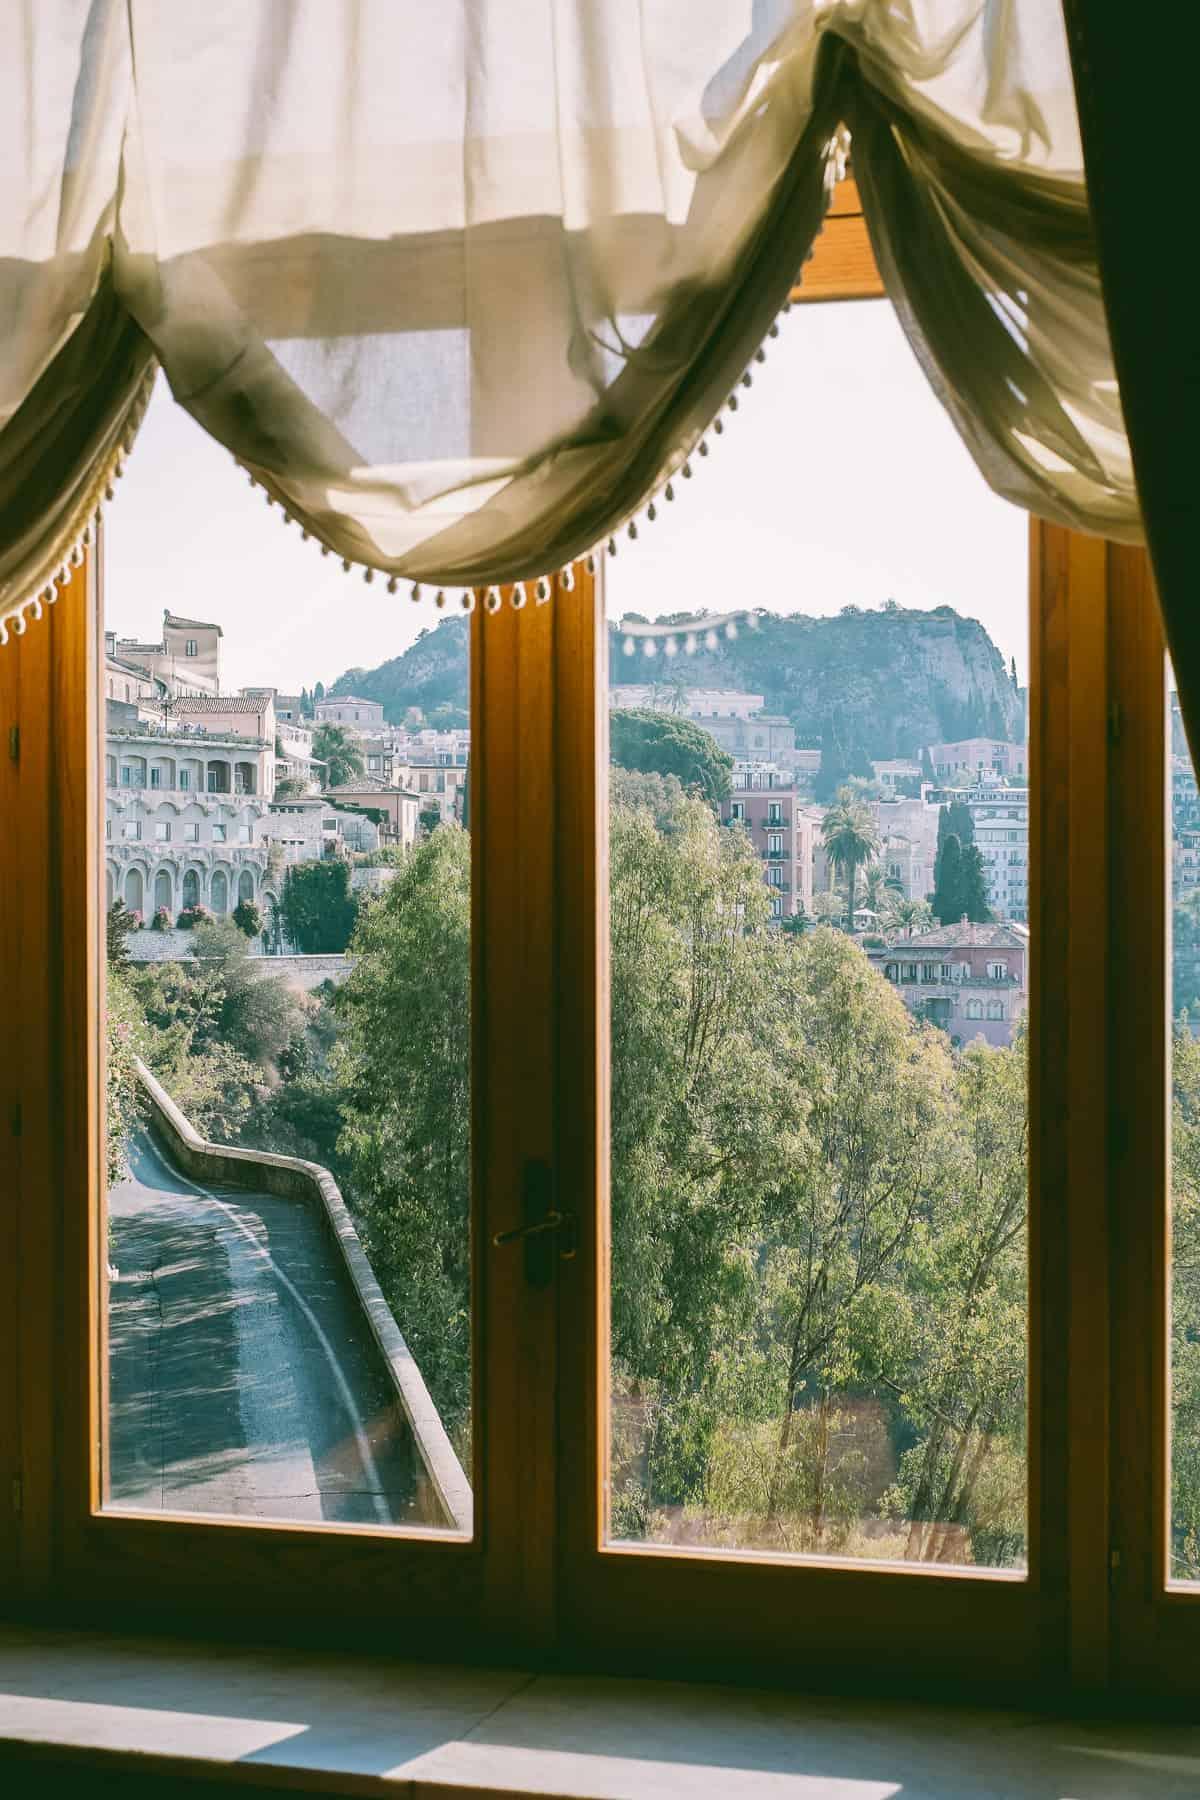 looking onto Taormina from the ornate windows of the San Domenico Palace Hotel Taormina Sicily